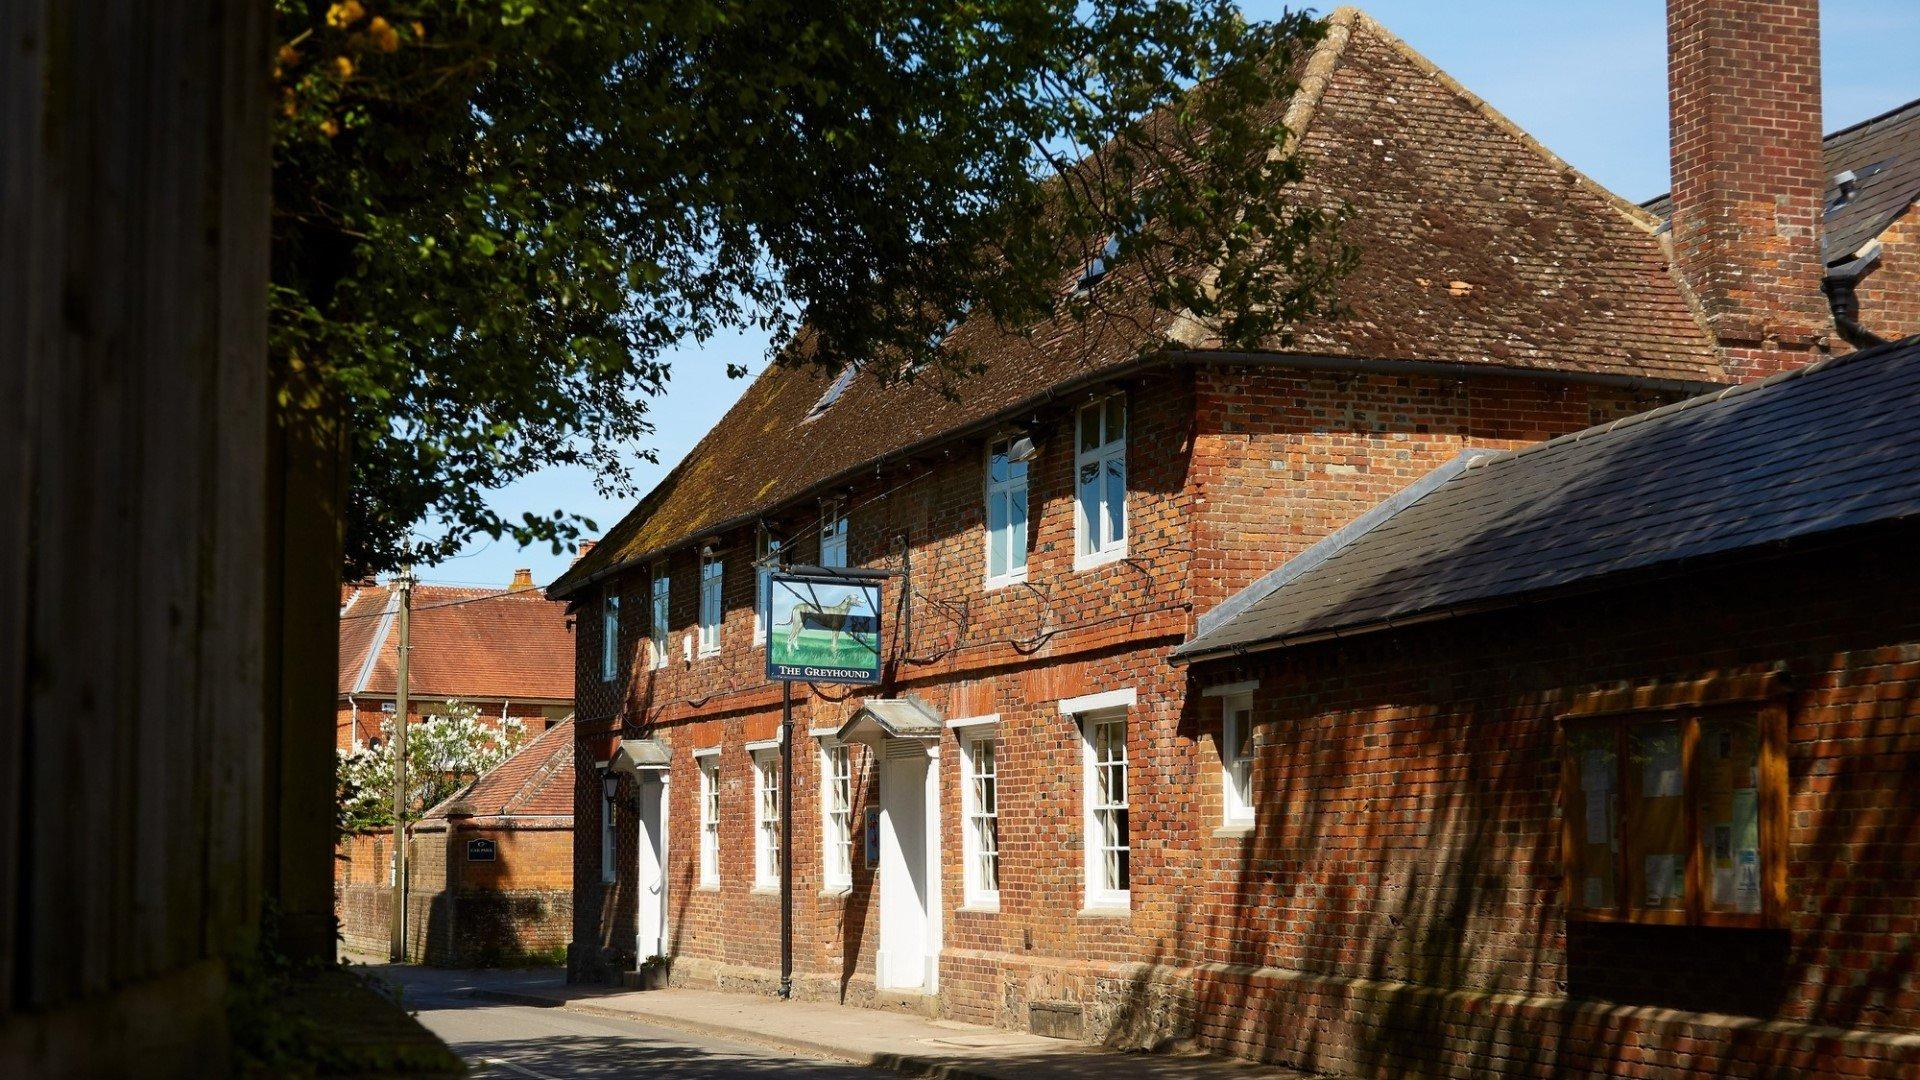 Greyhound Inn, Letcombe Regis, Wantage, Oxfordshire